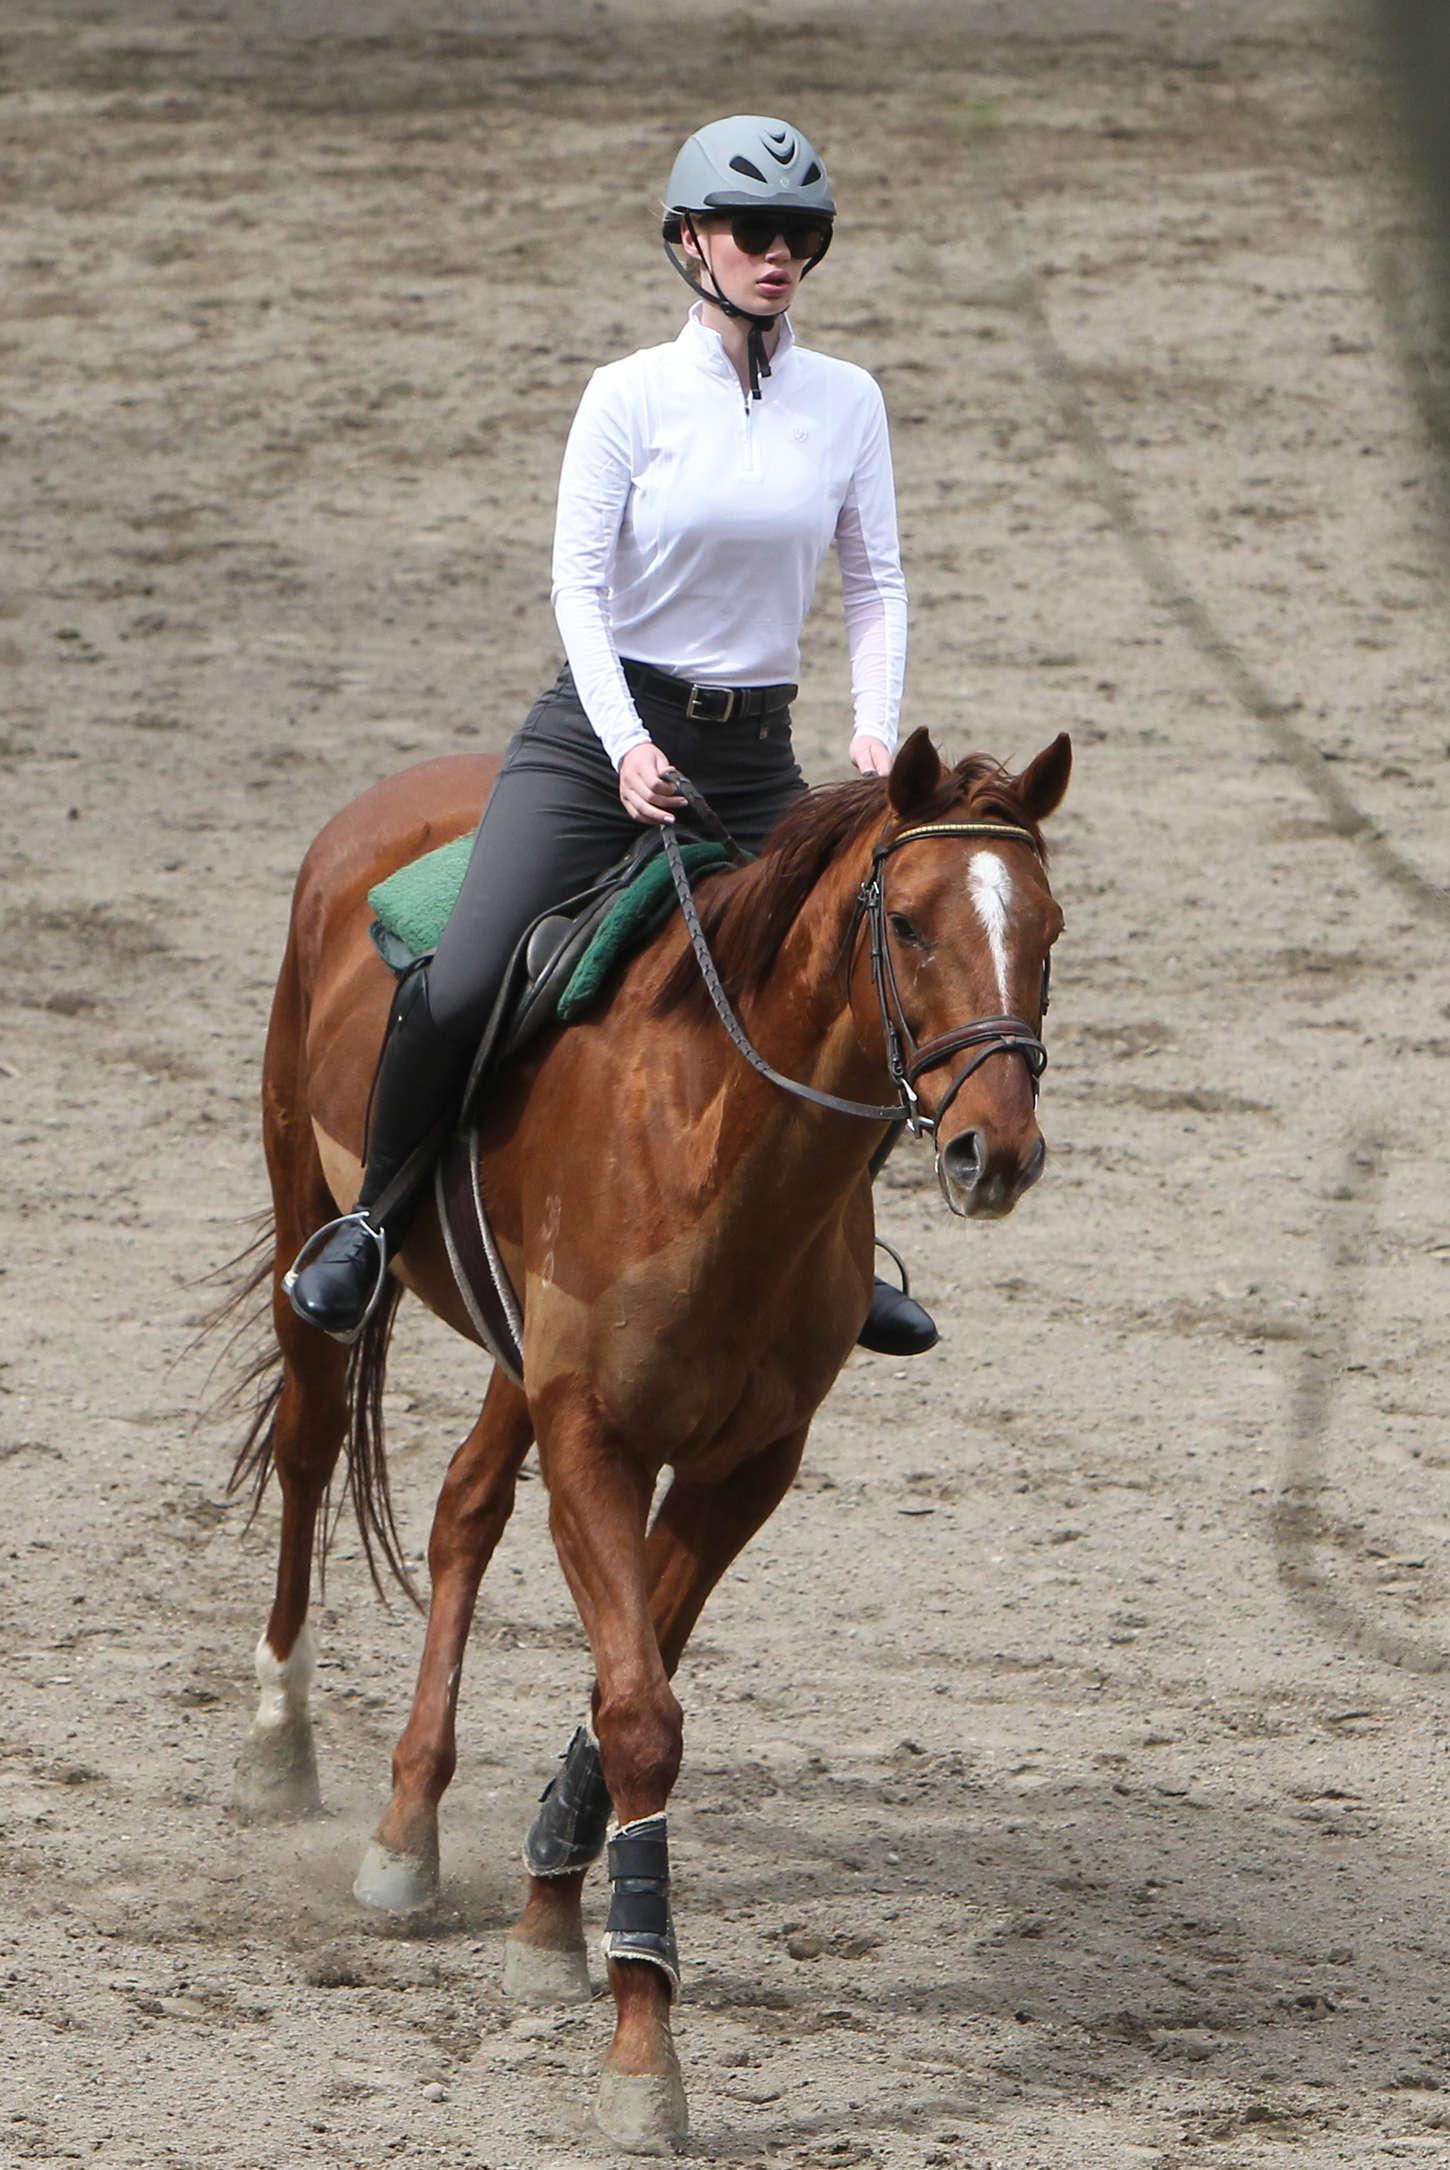 Back to FULL gallery Iggy Azalea – Horseback riding lesson in LA Gwen Stefani